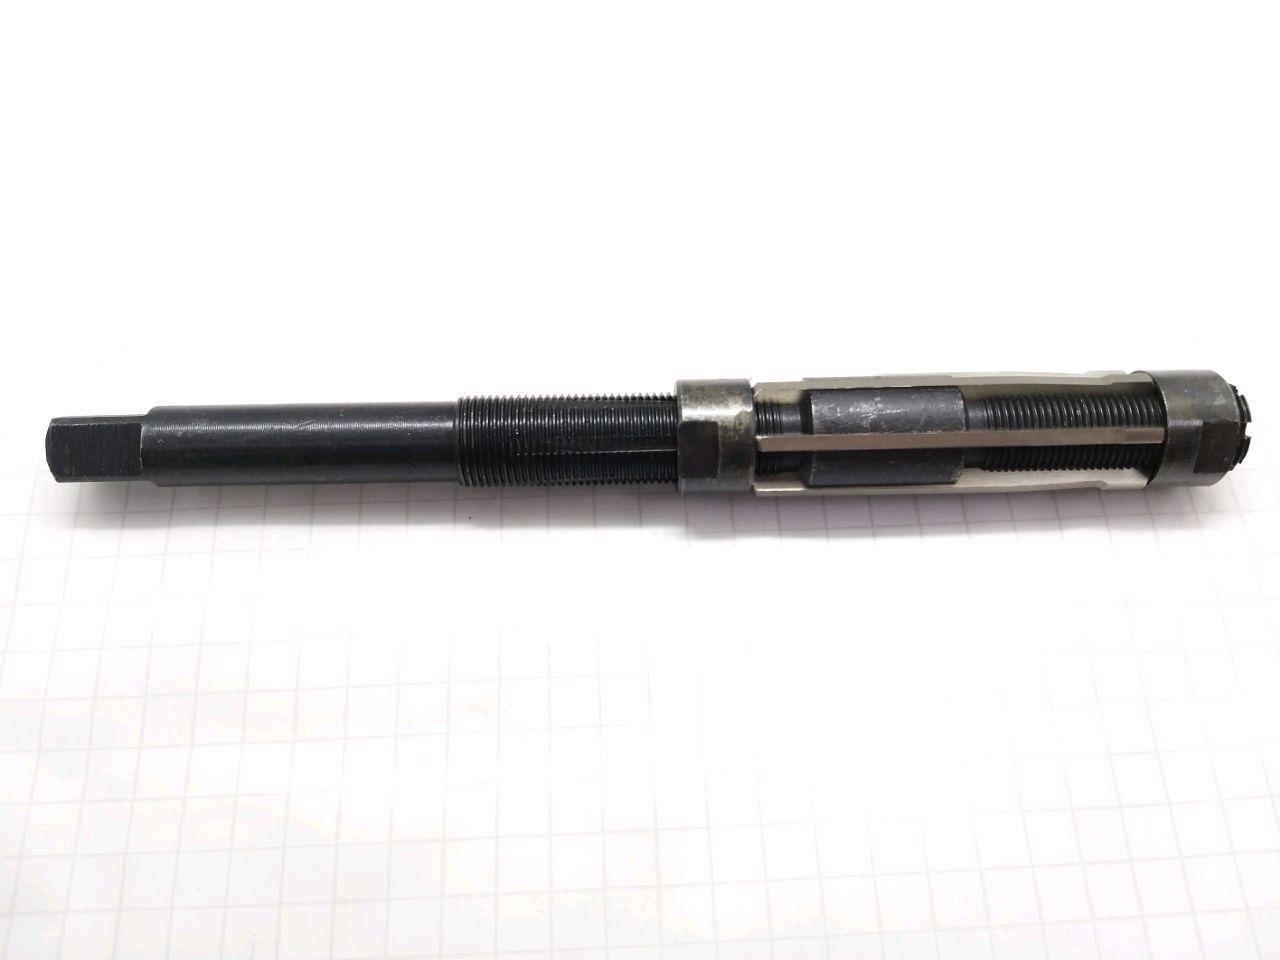 Alezor reglabil HSS 10,75-11,75mm